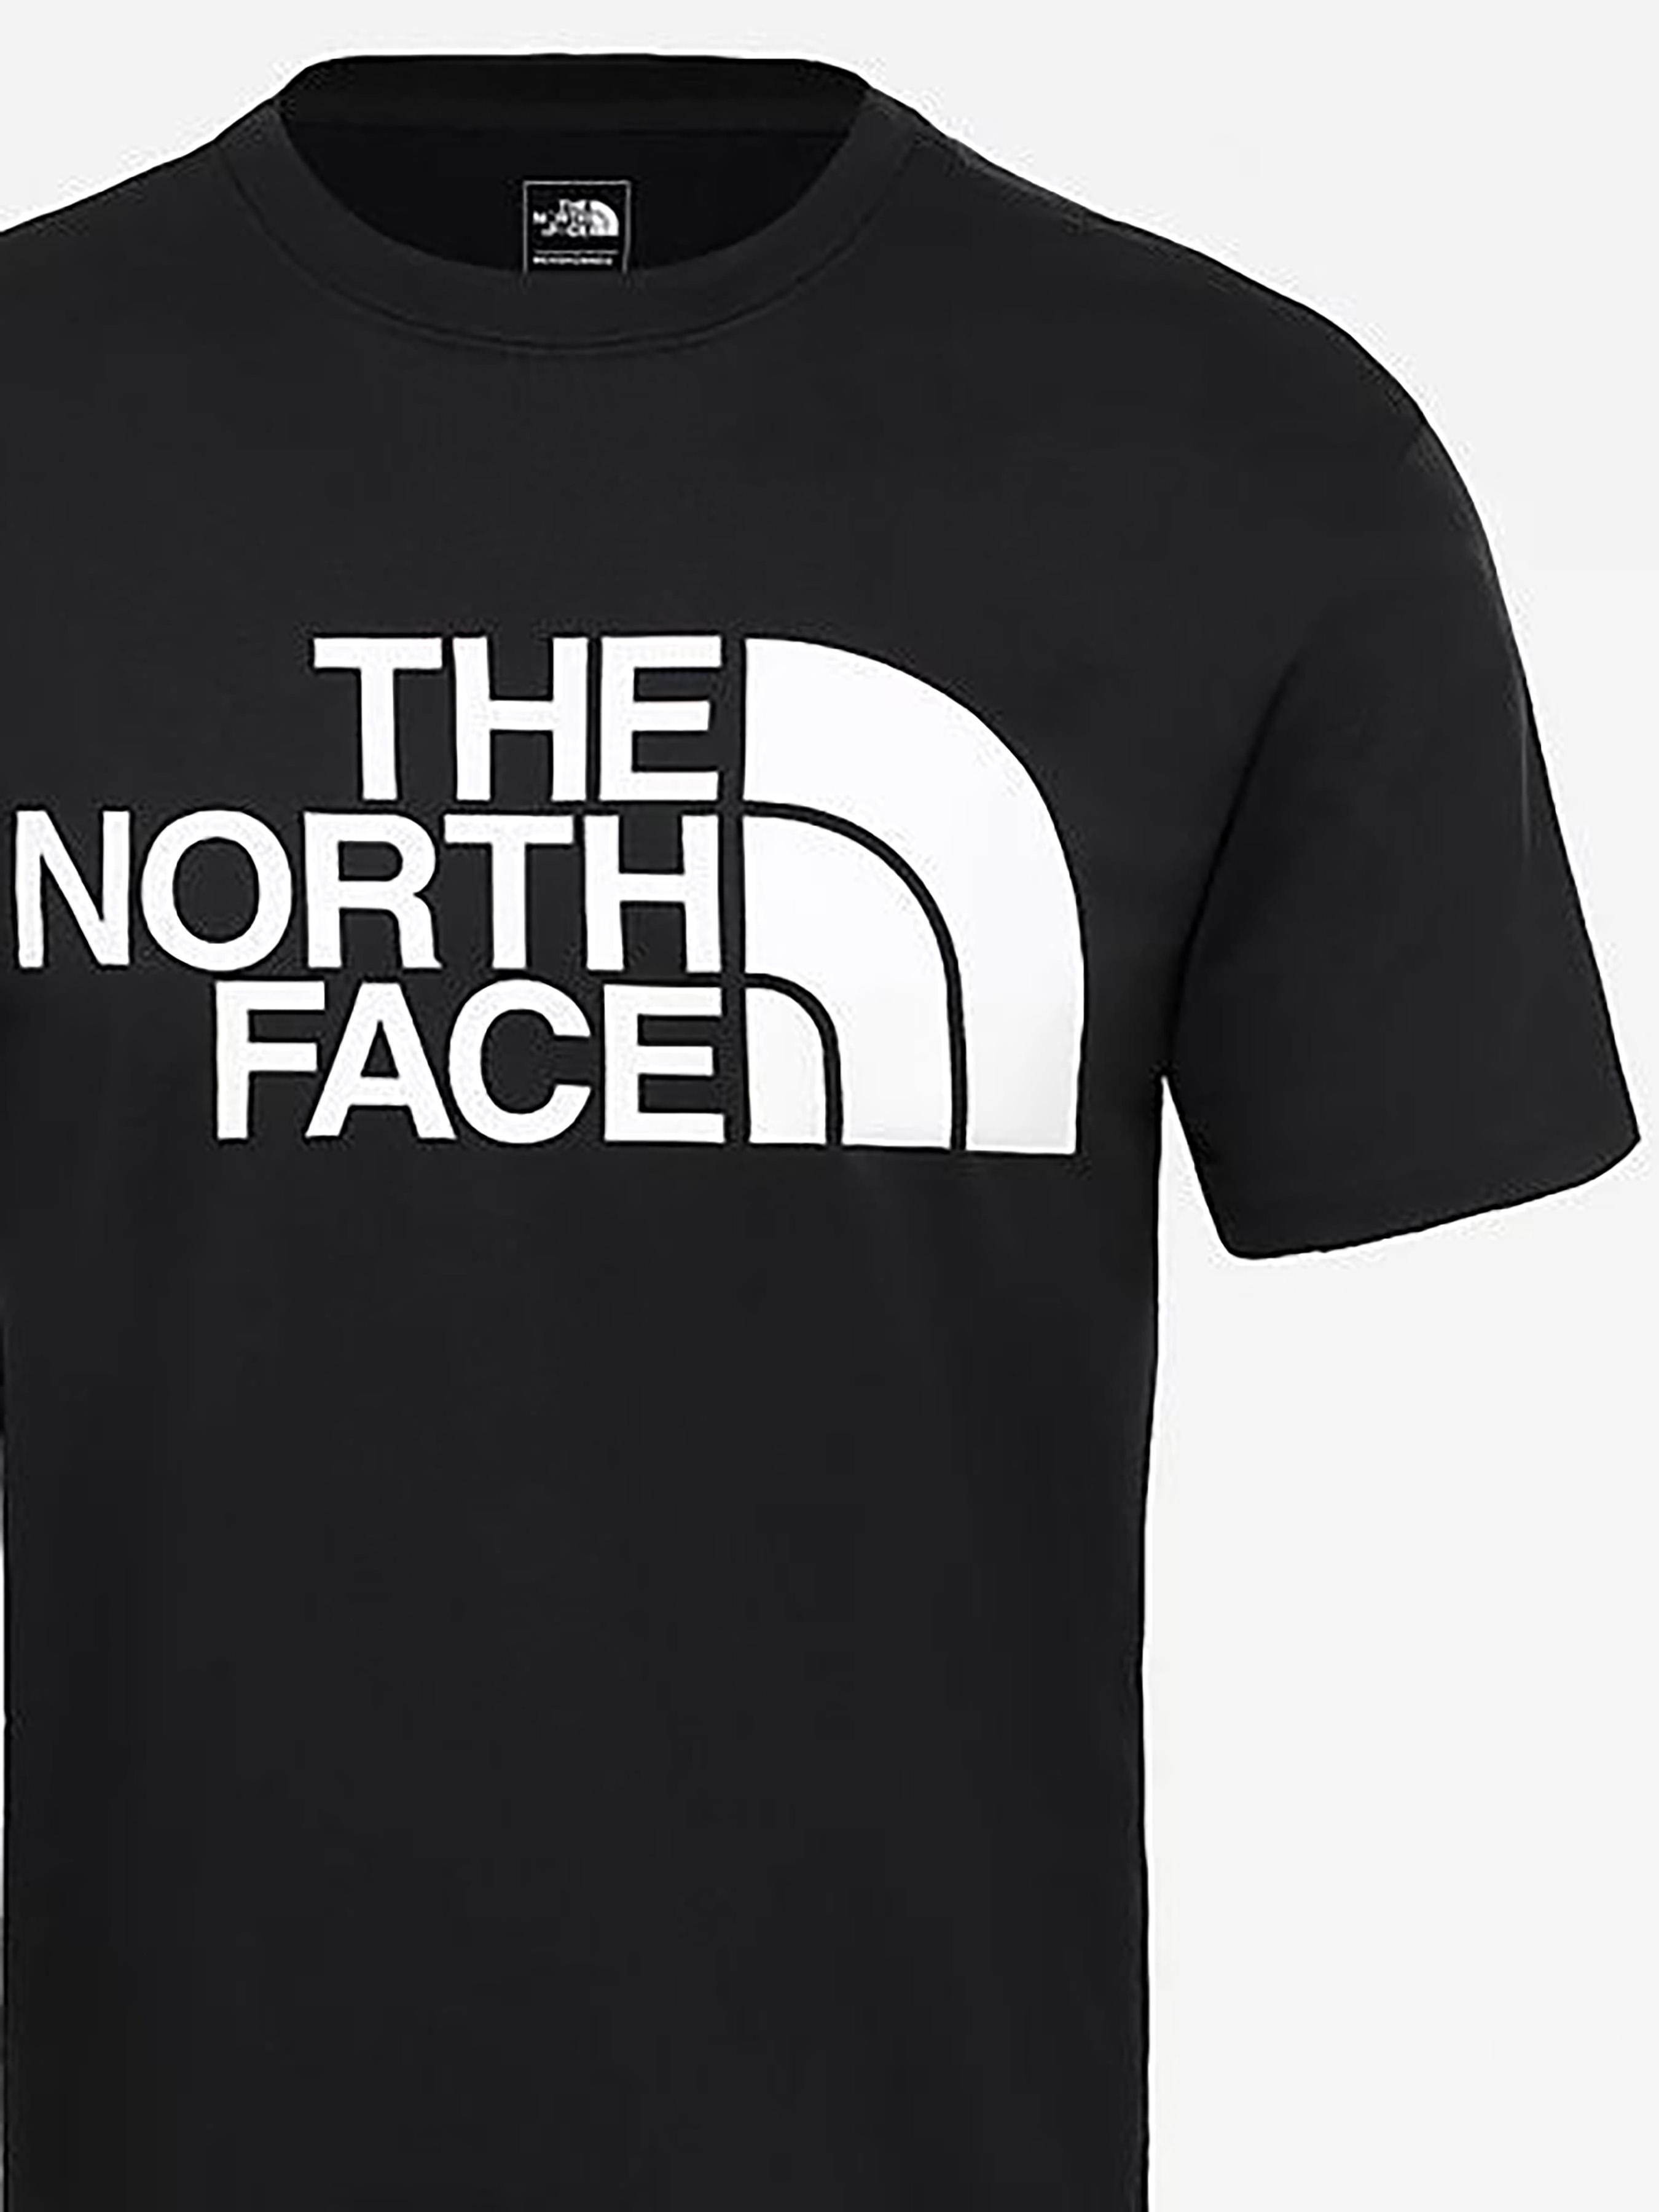 The North Face Футболка чоловічі модель NF0A3YIJKY41 , 2017